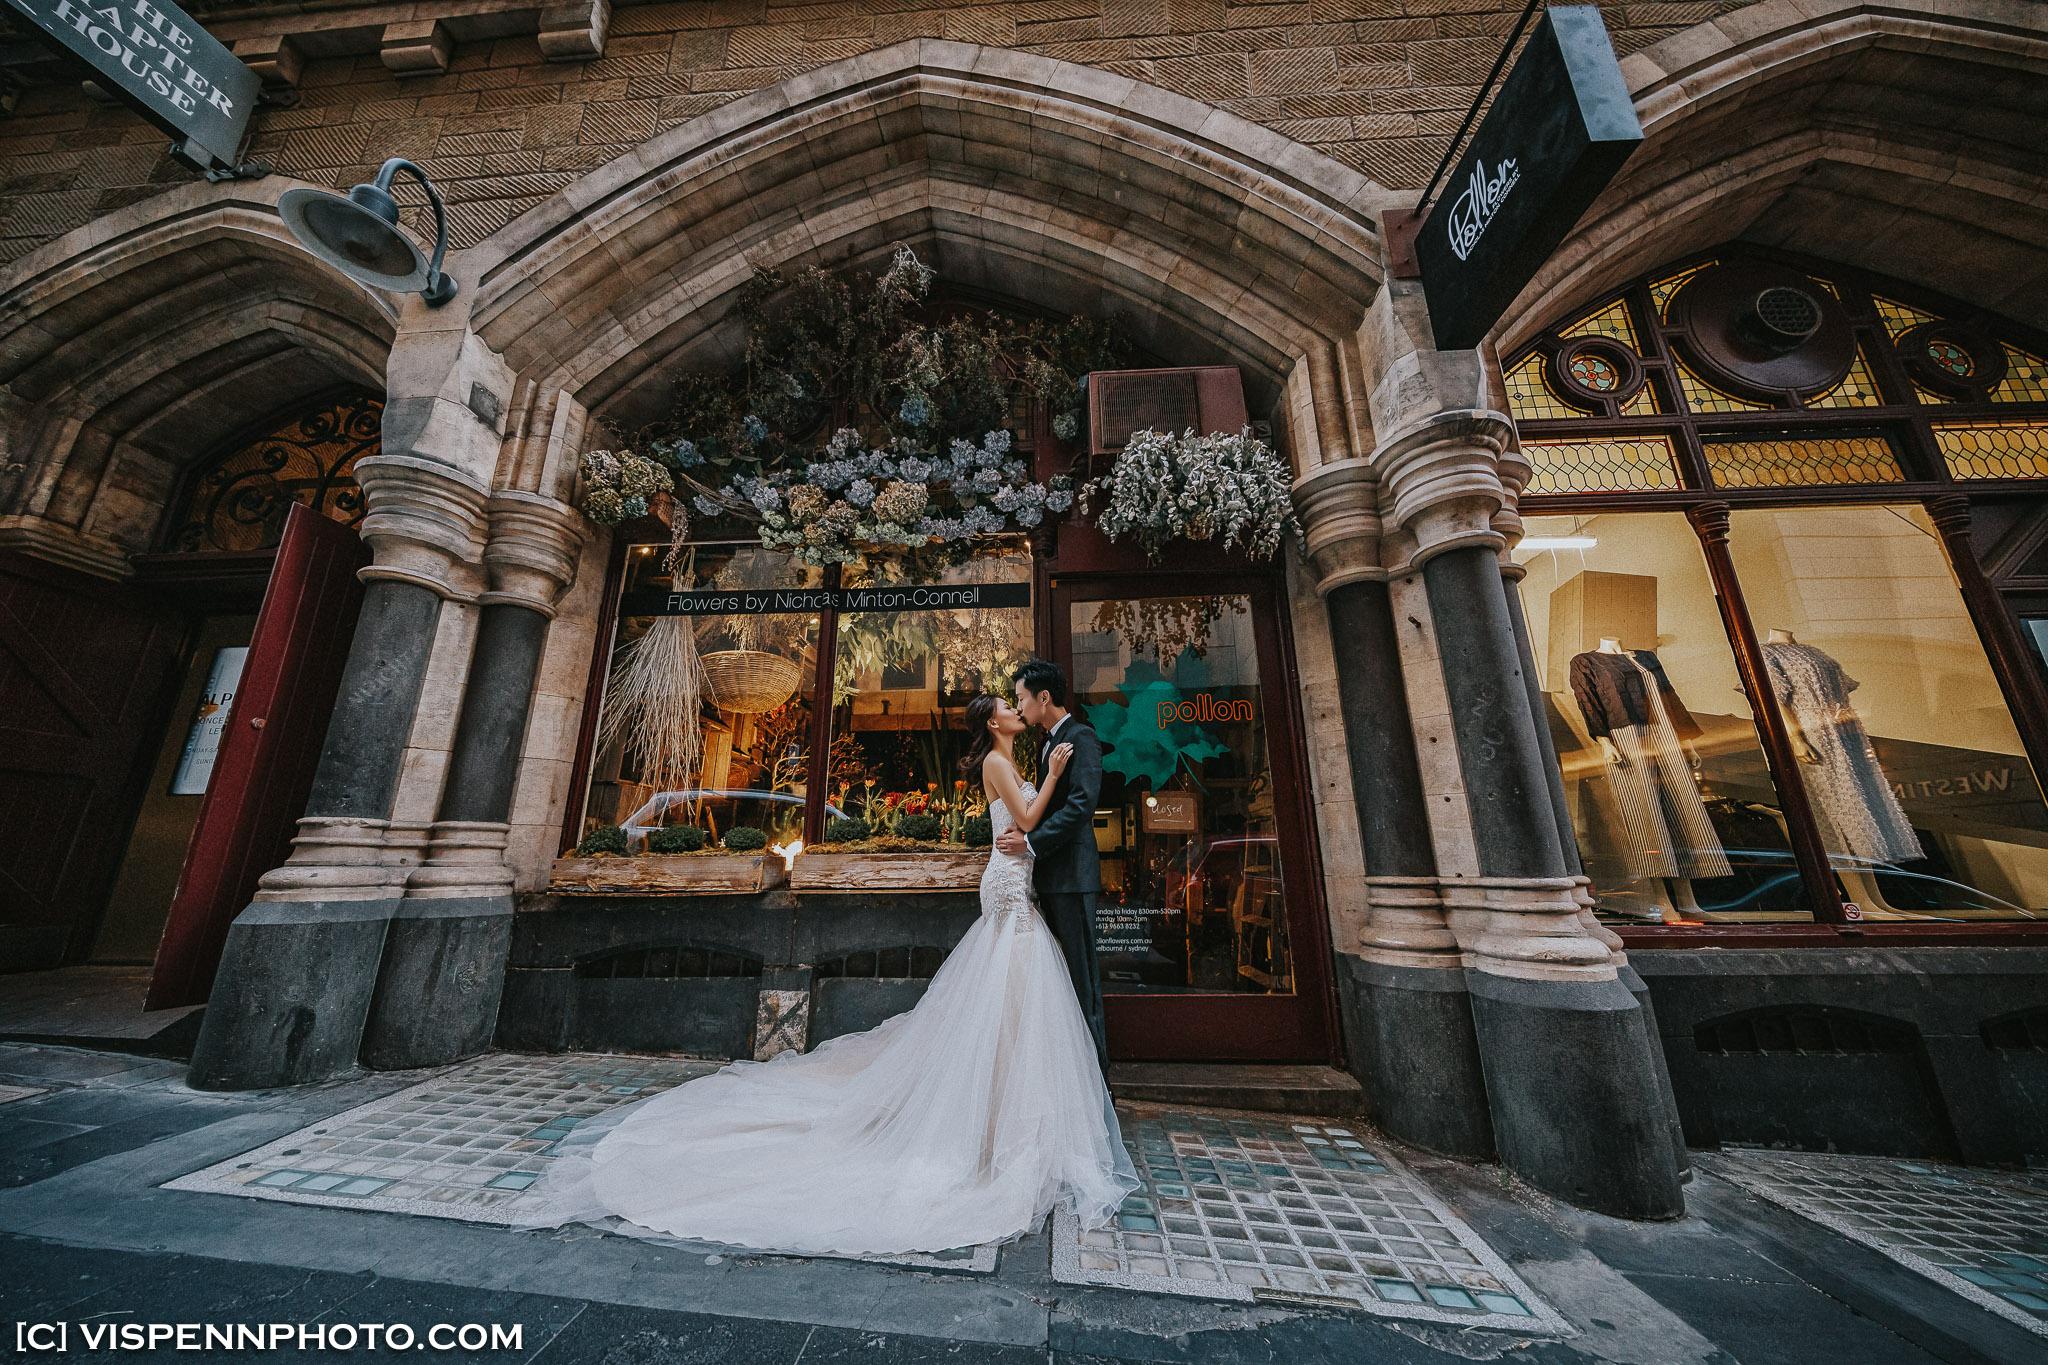 PRE WEDDING Photography Melbourne 5D4 1785